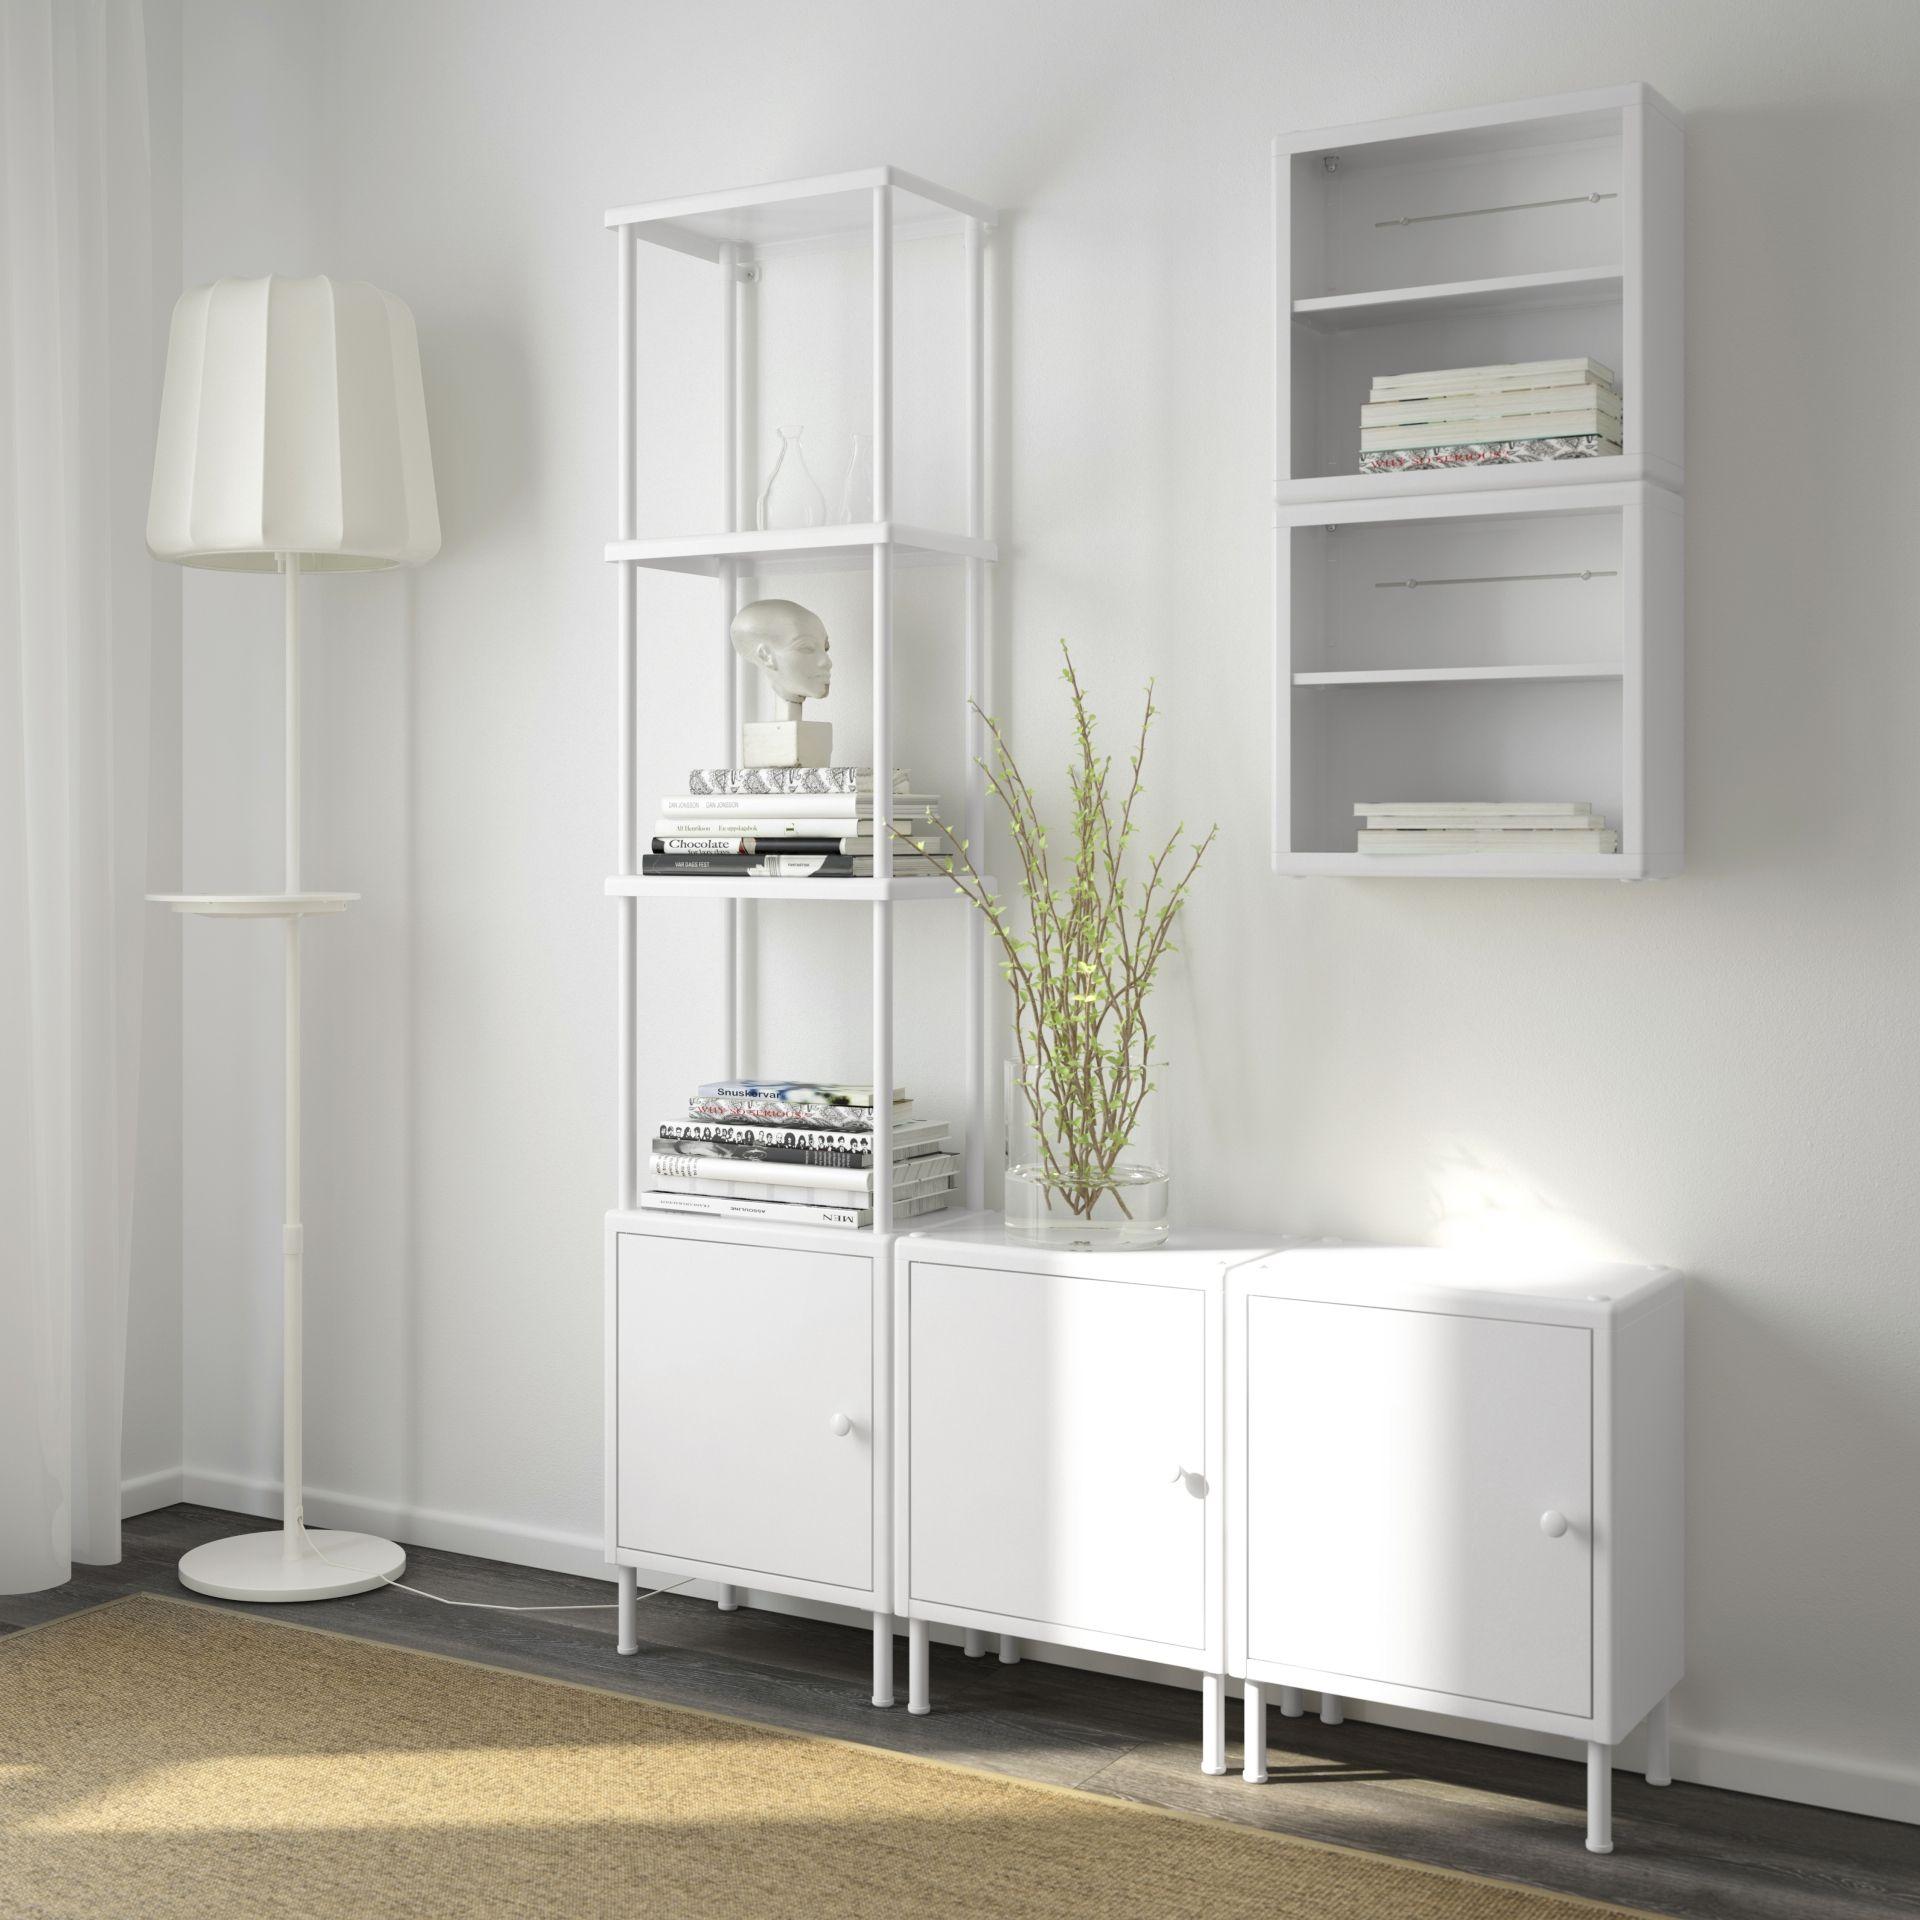 Lavabo wc ikea beautiful meuble salle bain bois design for Meuble wc